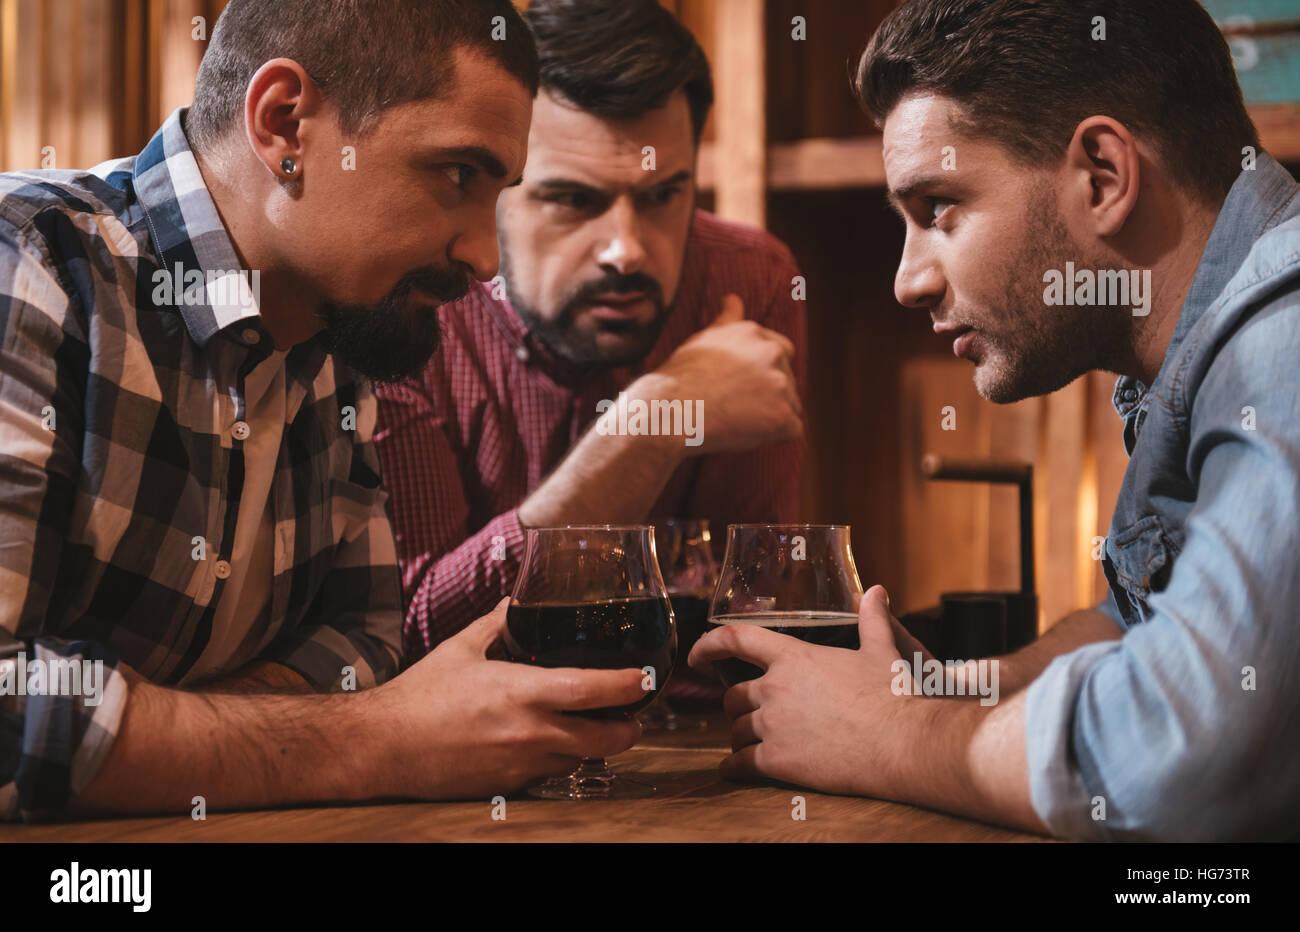 Handsome attractive men exchanging their secrets - Stock Image